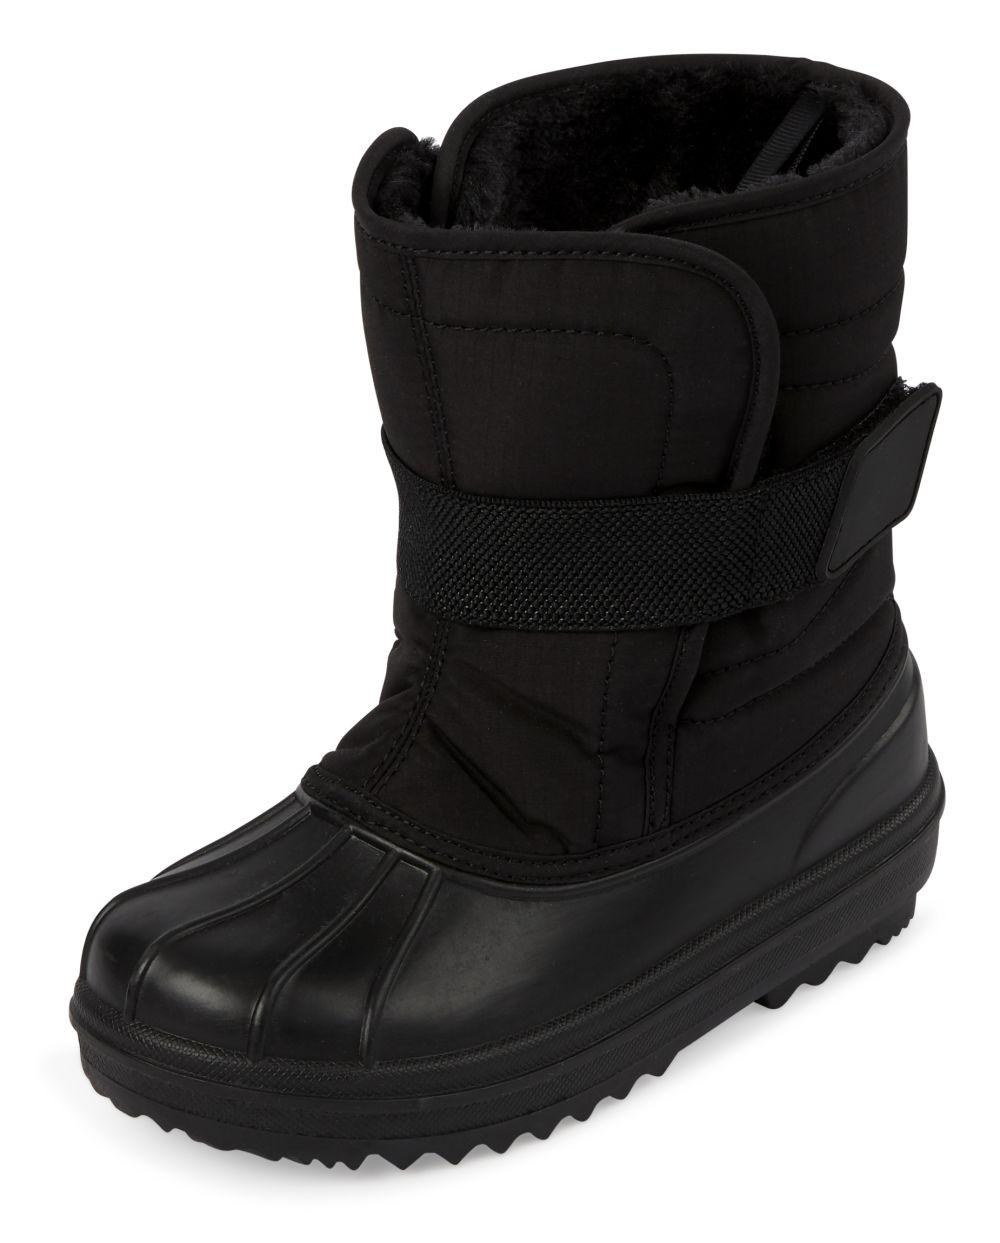 Boys Snow Boots